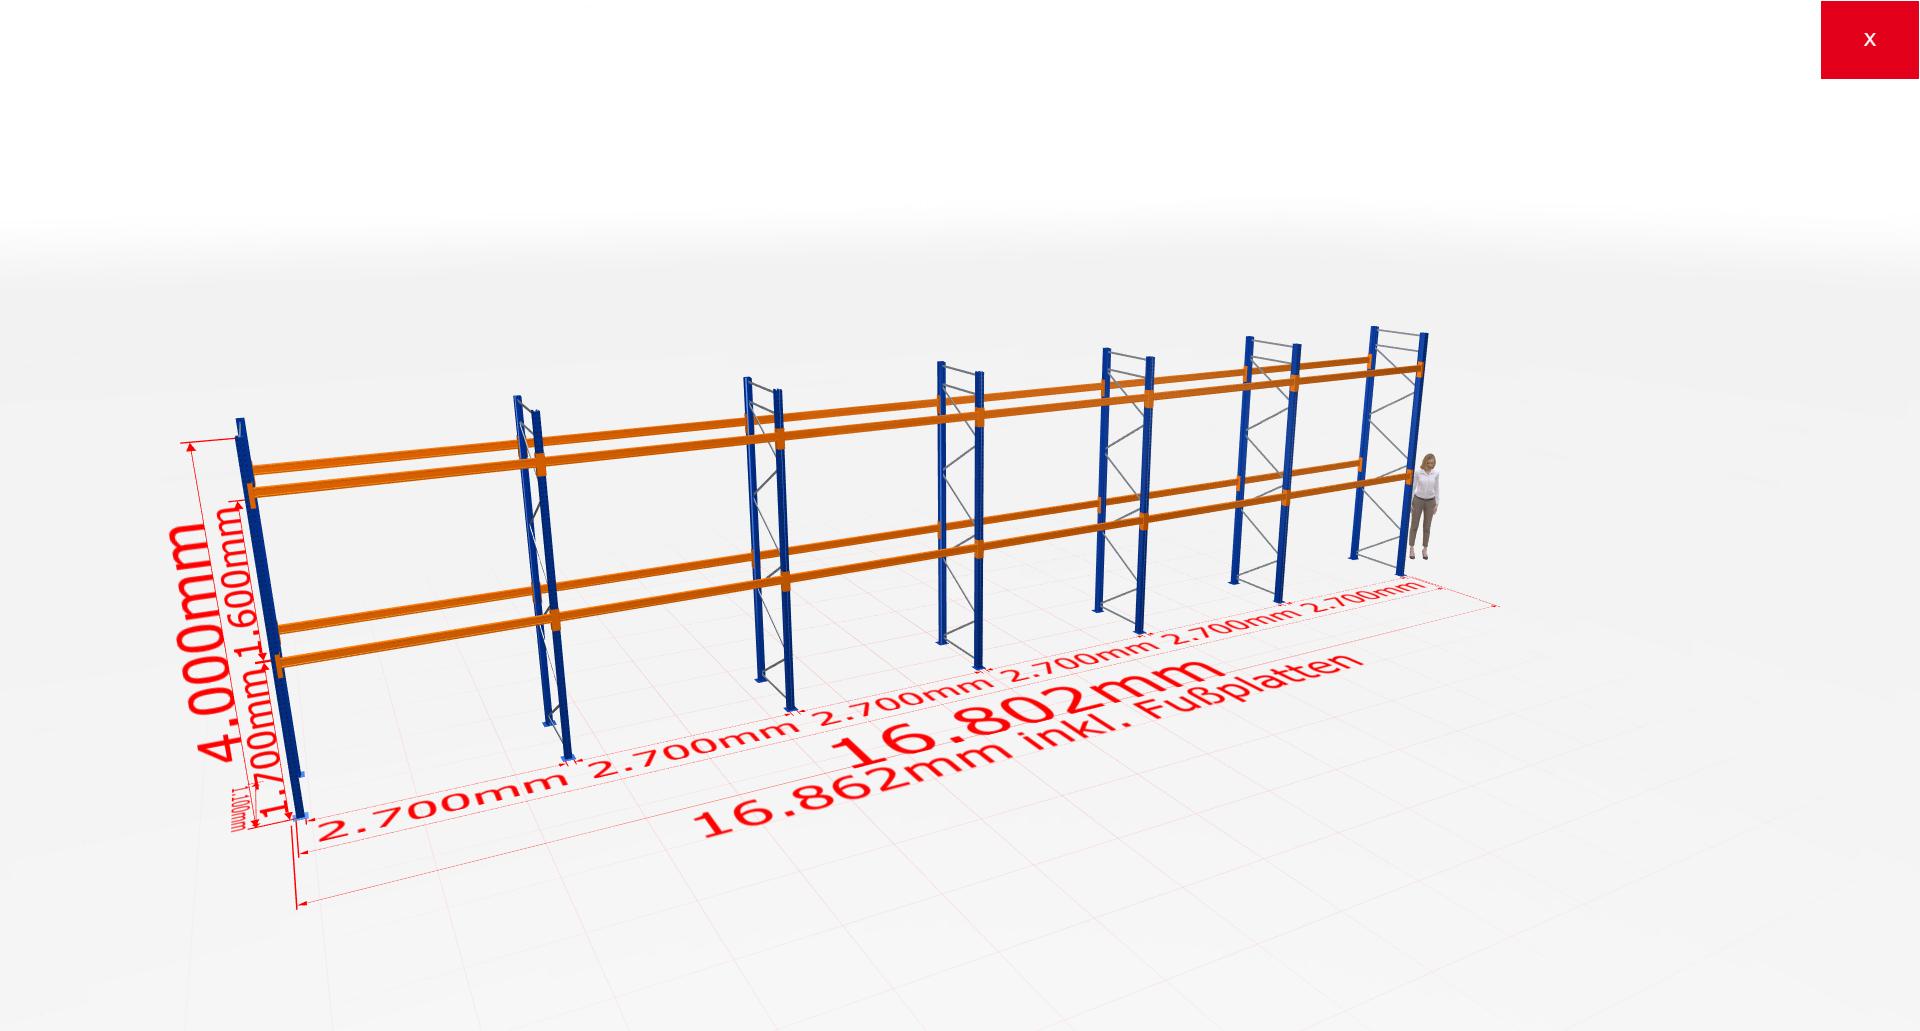 Palettenregal Komplettregal 4000x16802x1100 mm (HxBxT) 2 Fachebenen SCHULTE Lagertechnik